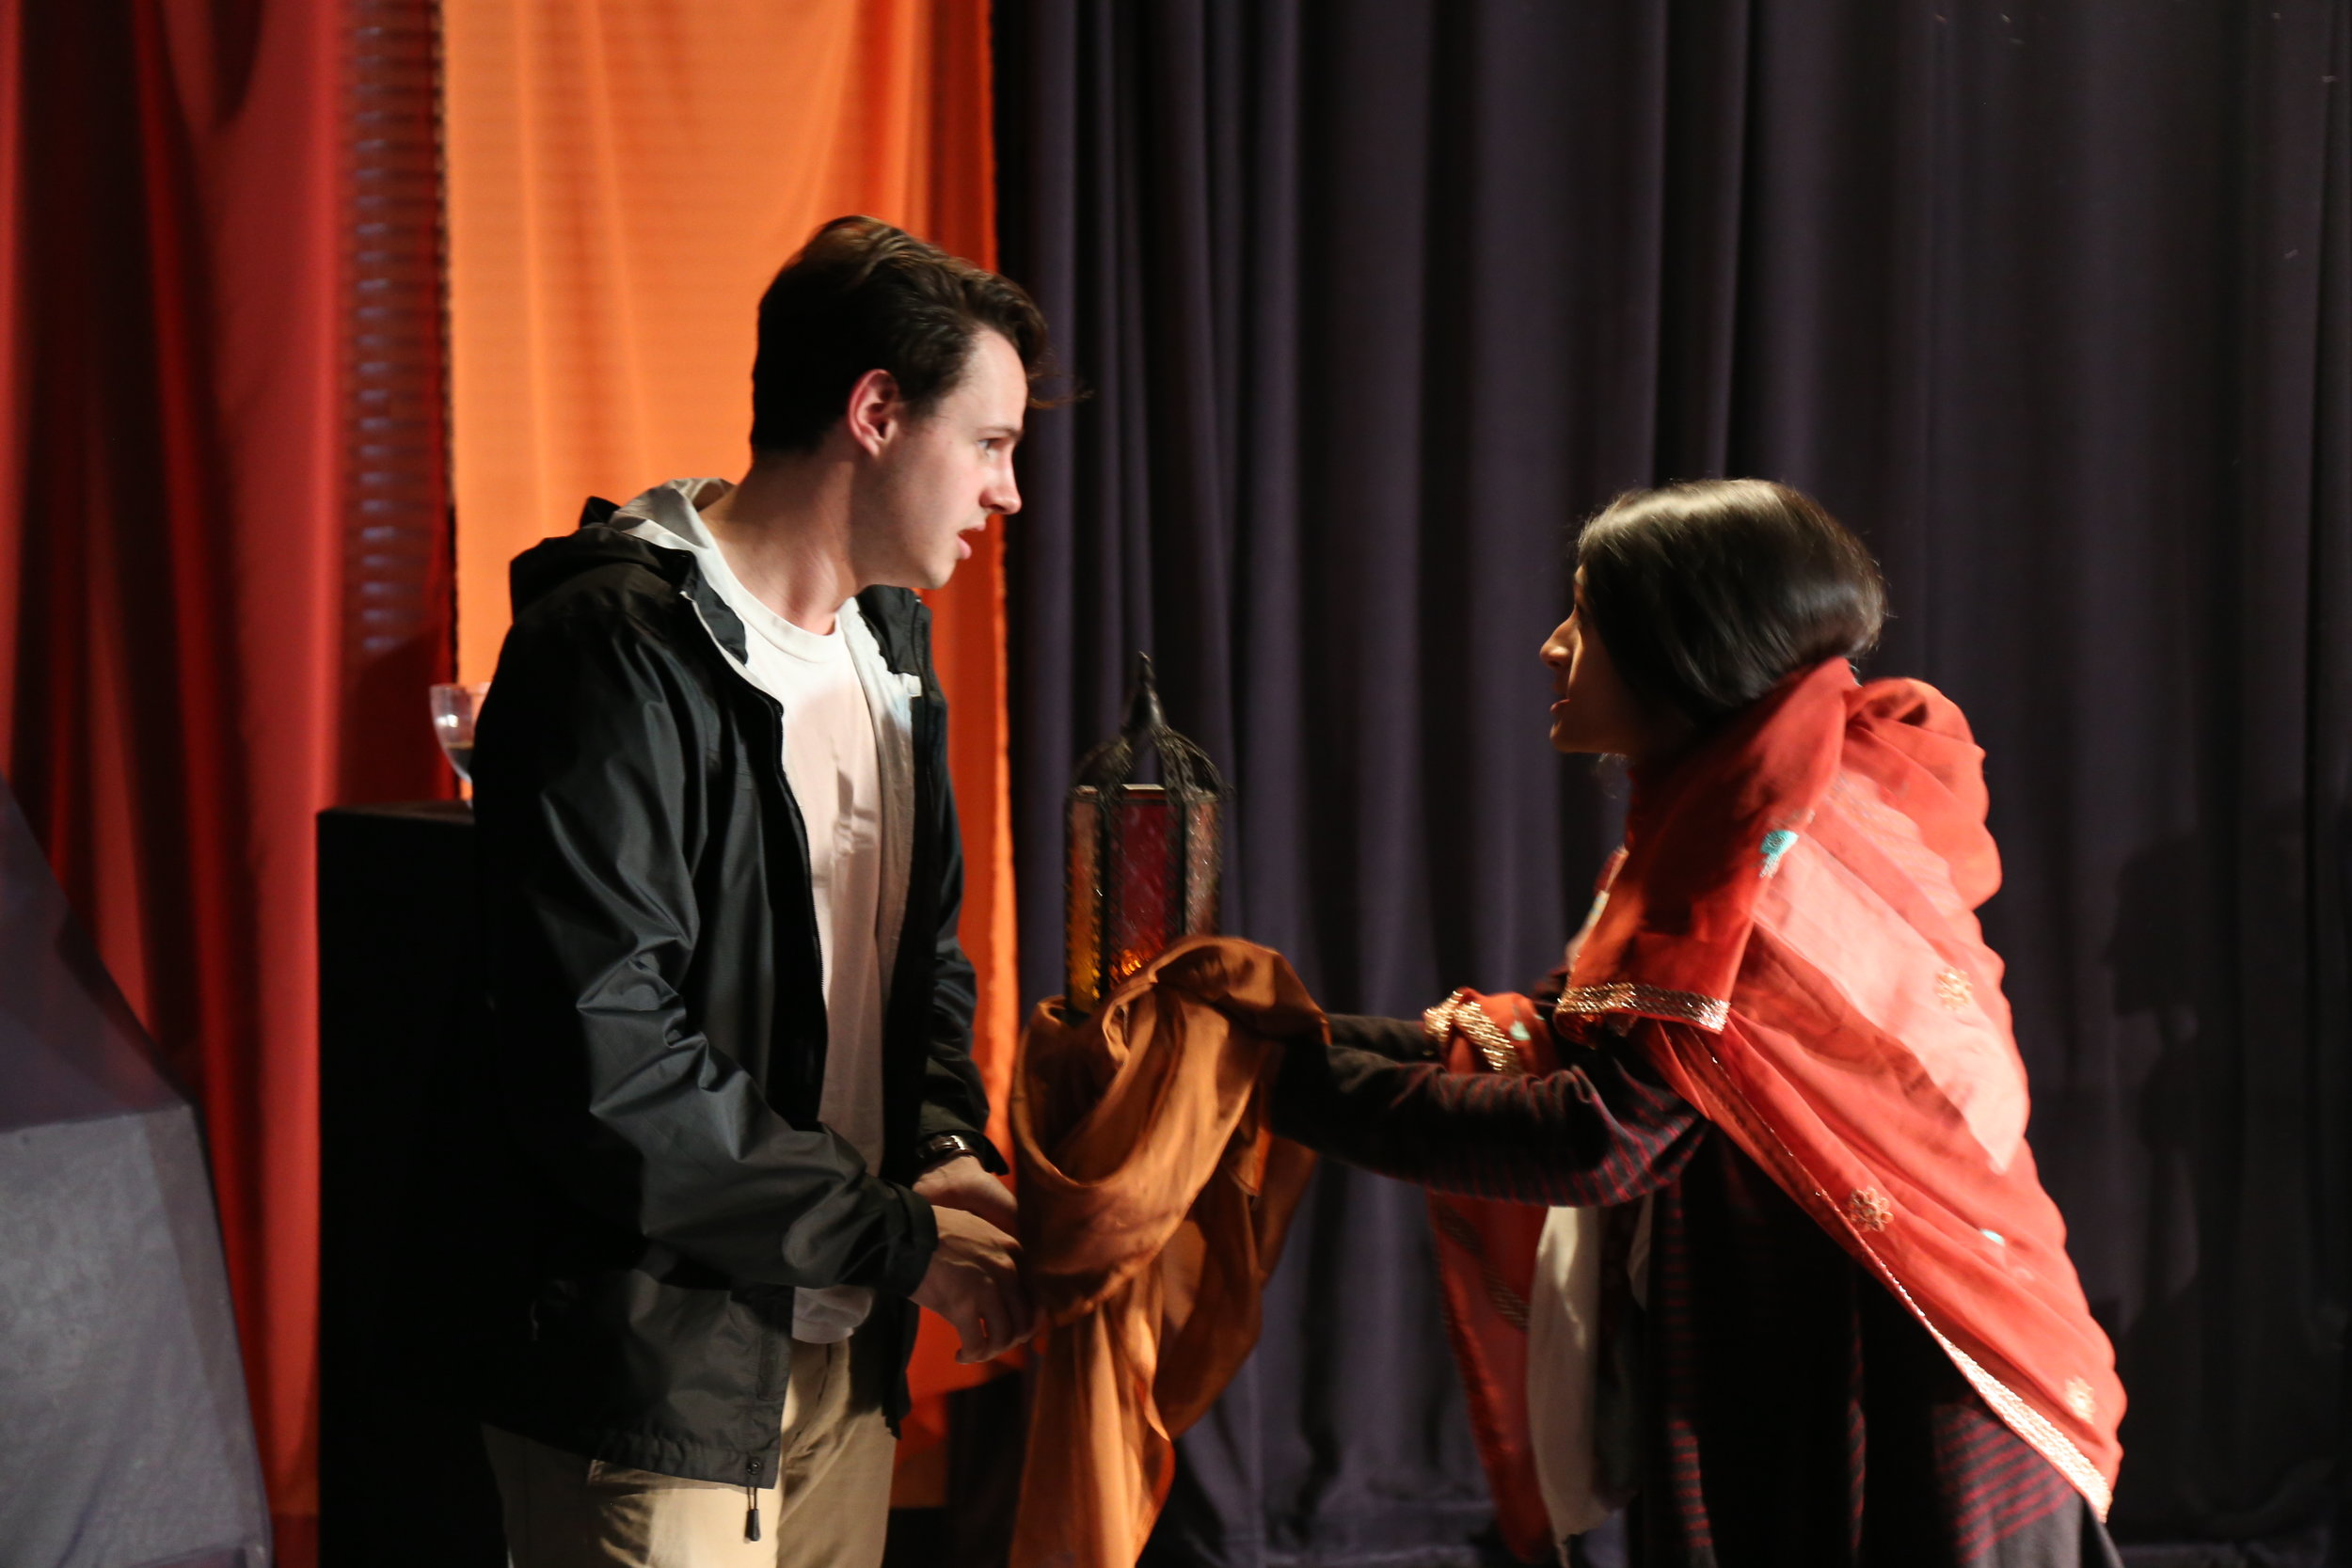 Brooks Laney and Shanaya Kapai in UT Austin's production, 2016. Photo credit: Yitai Chung